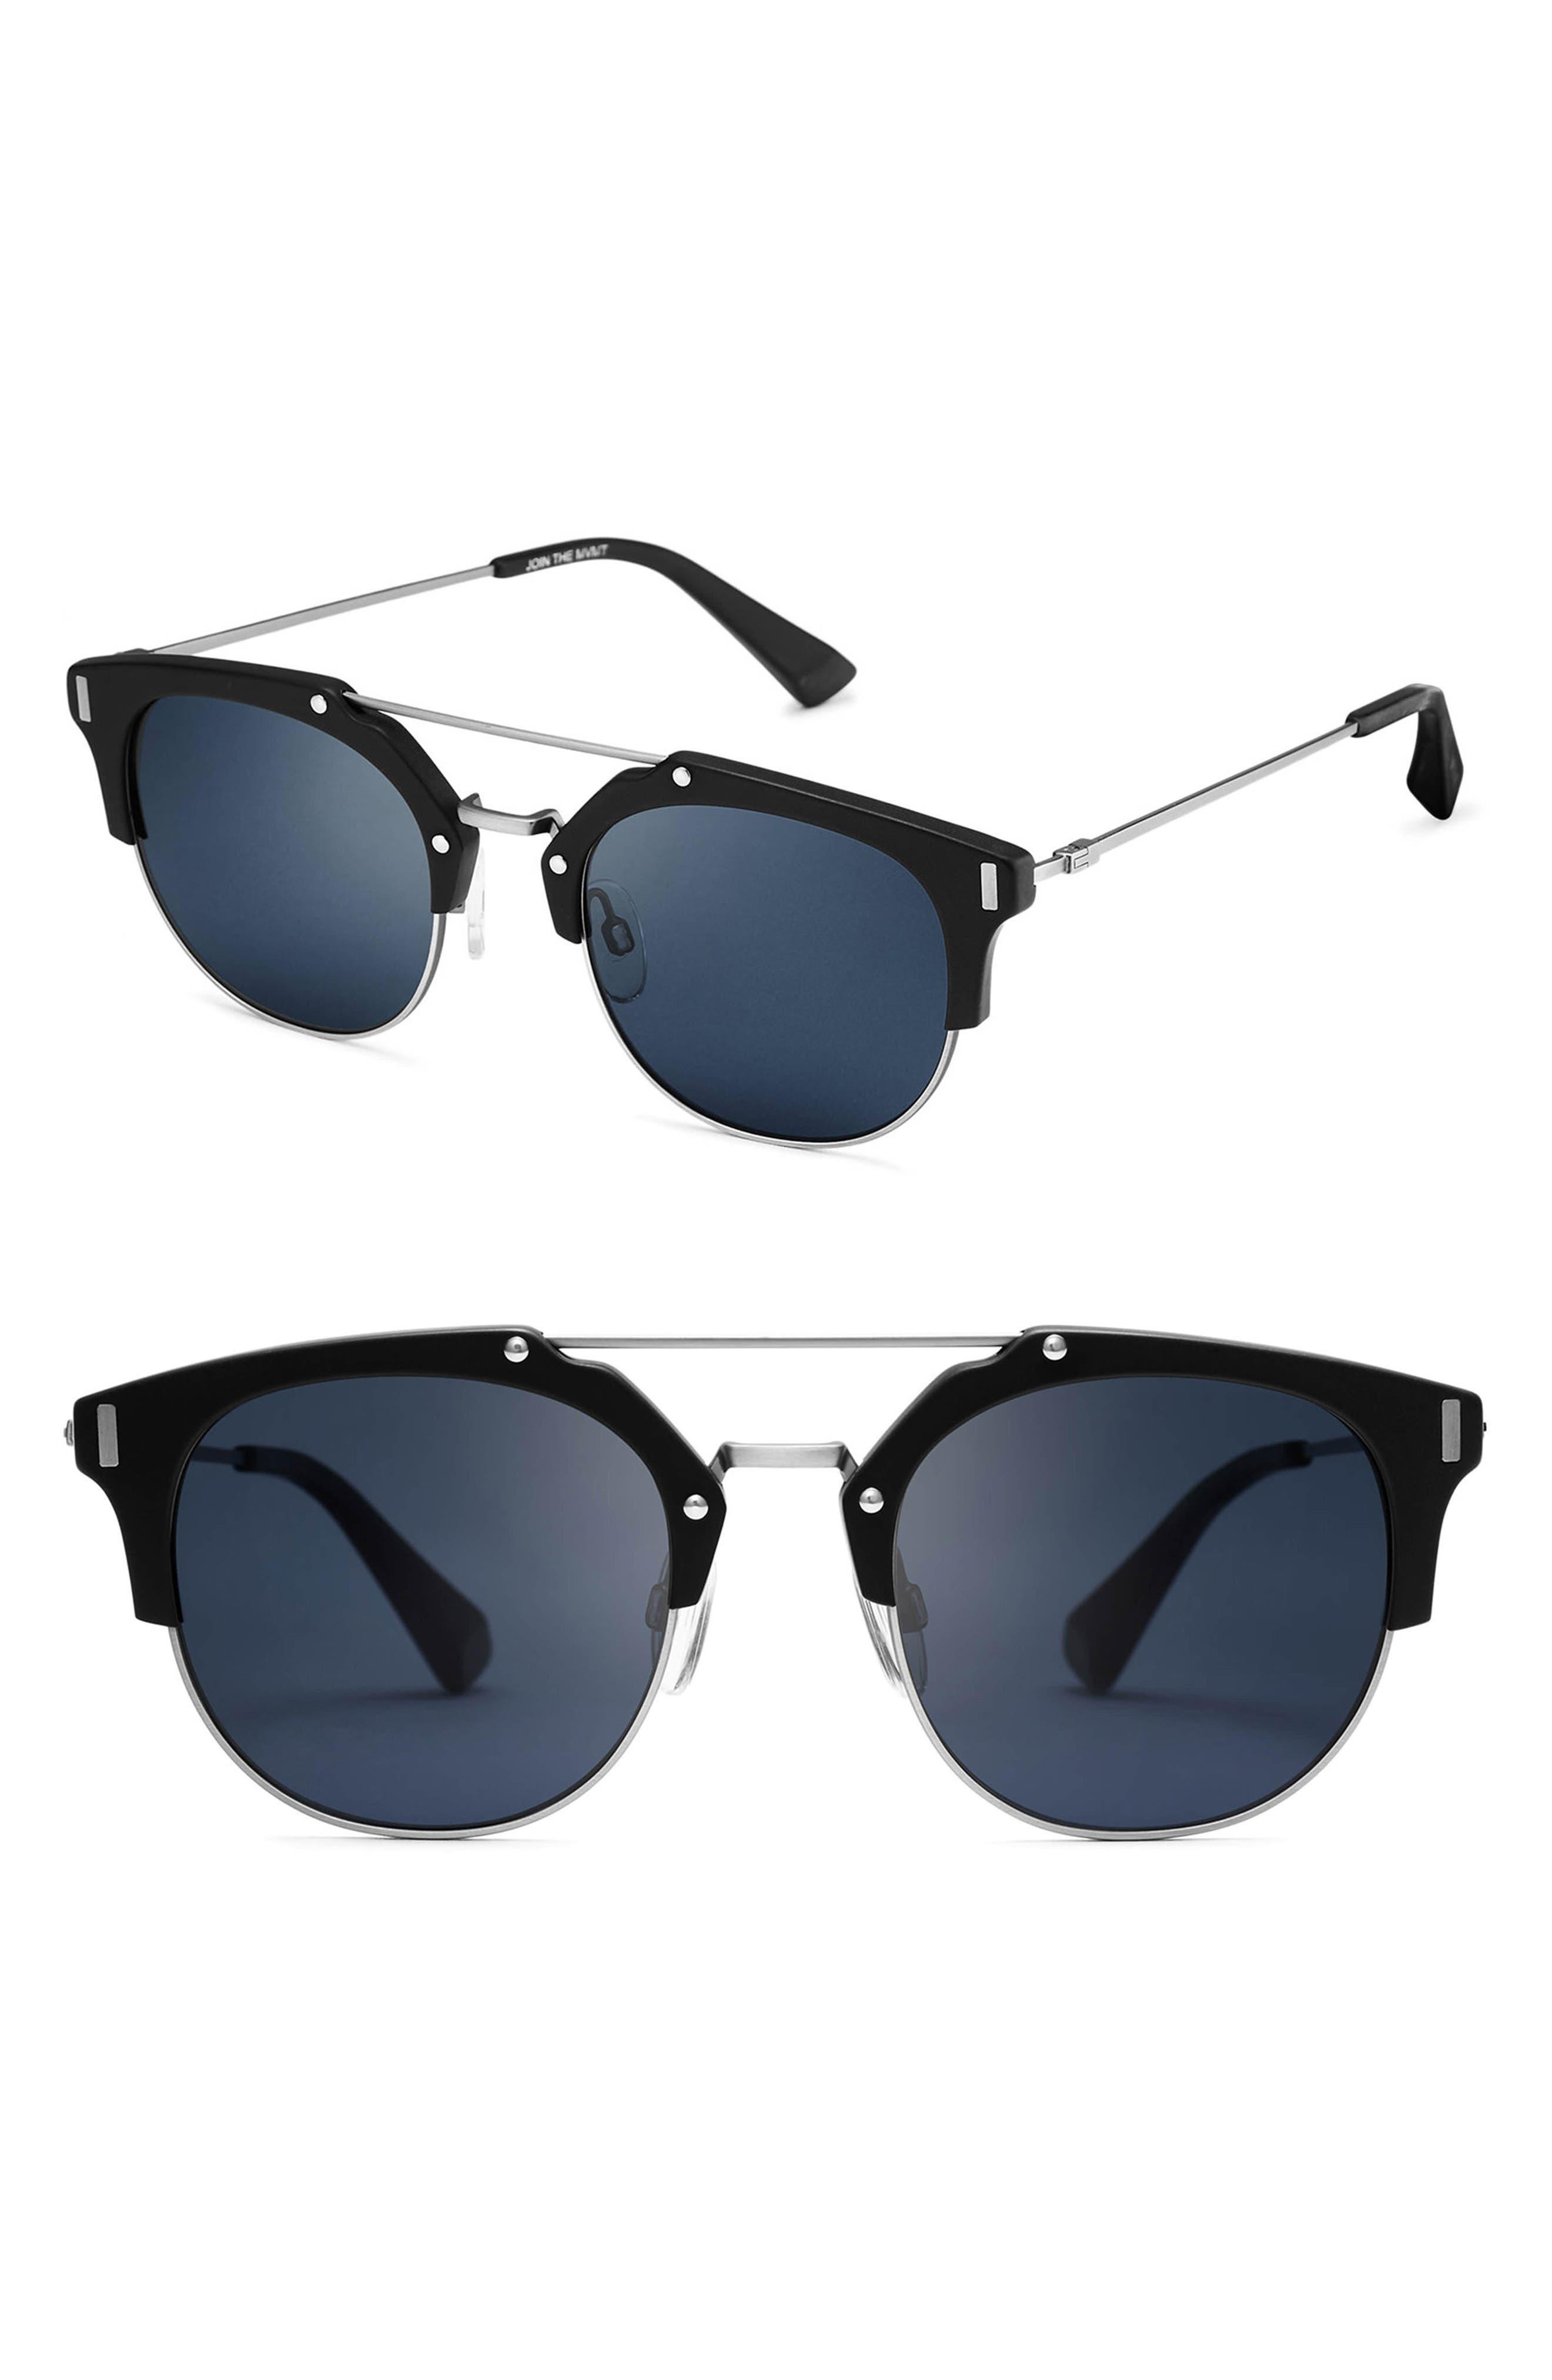 Weekend 51mm Sunglasses,                             Main thumbnail 1, color,                             Matte Black